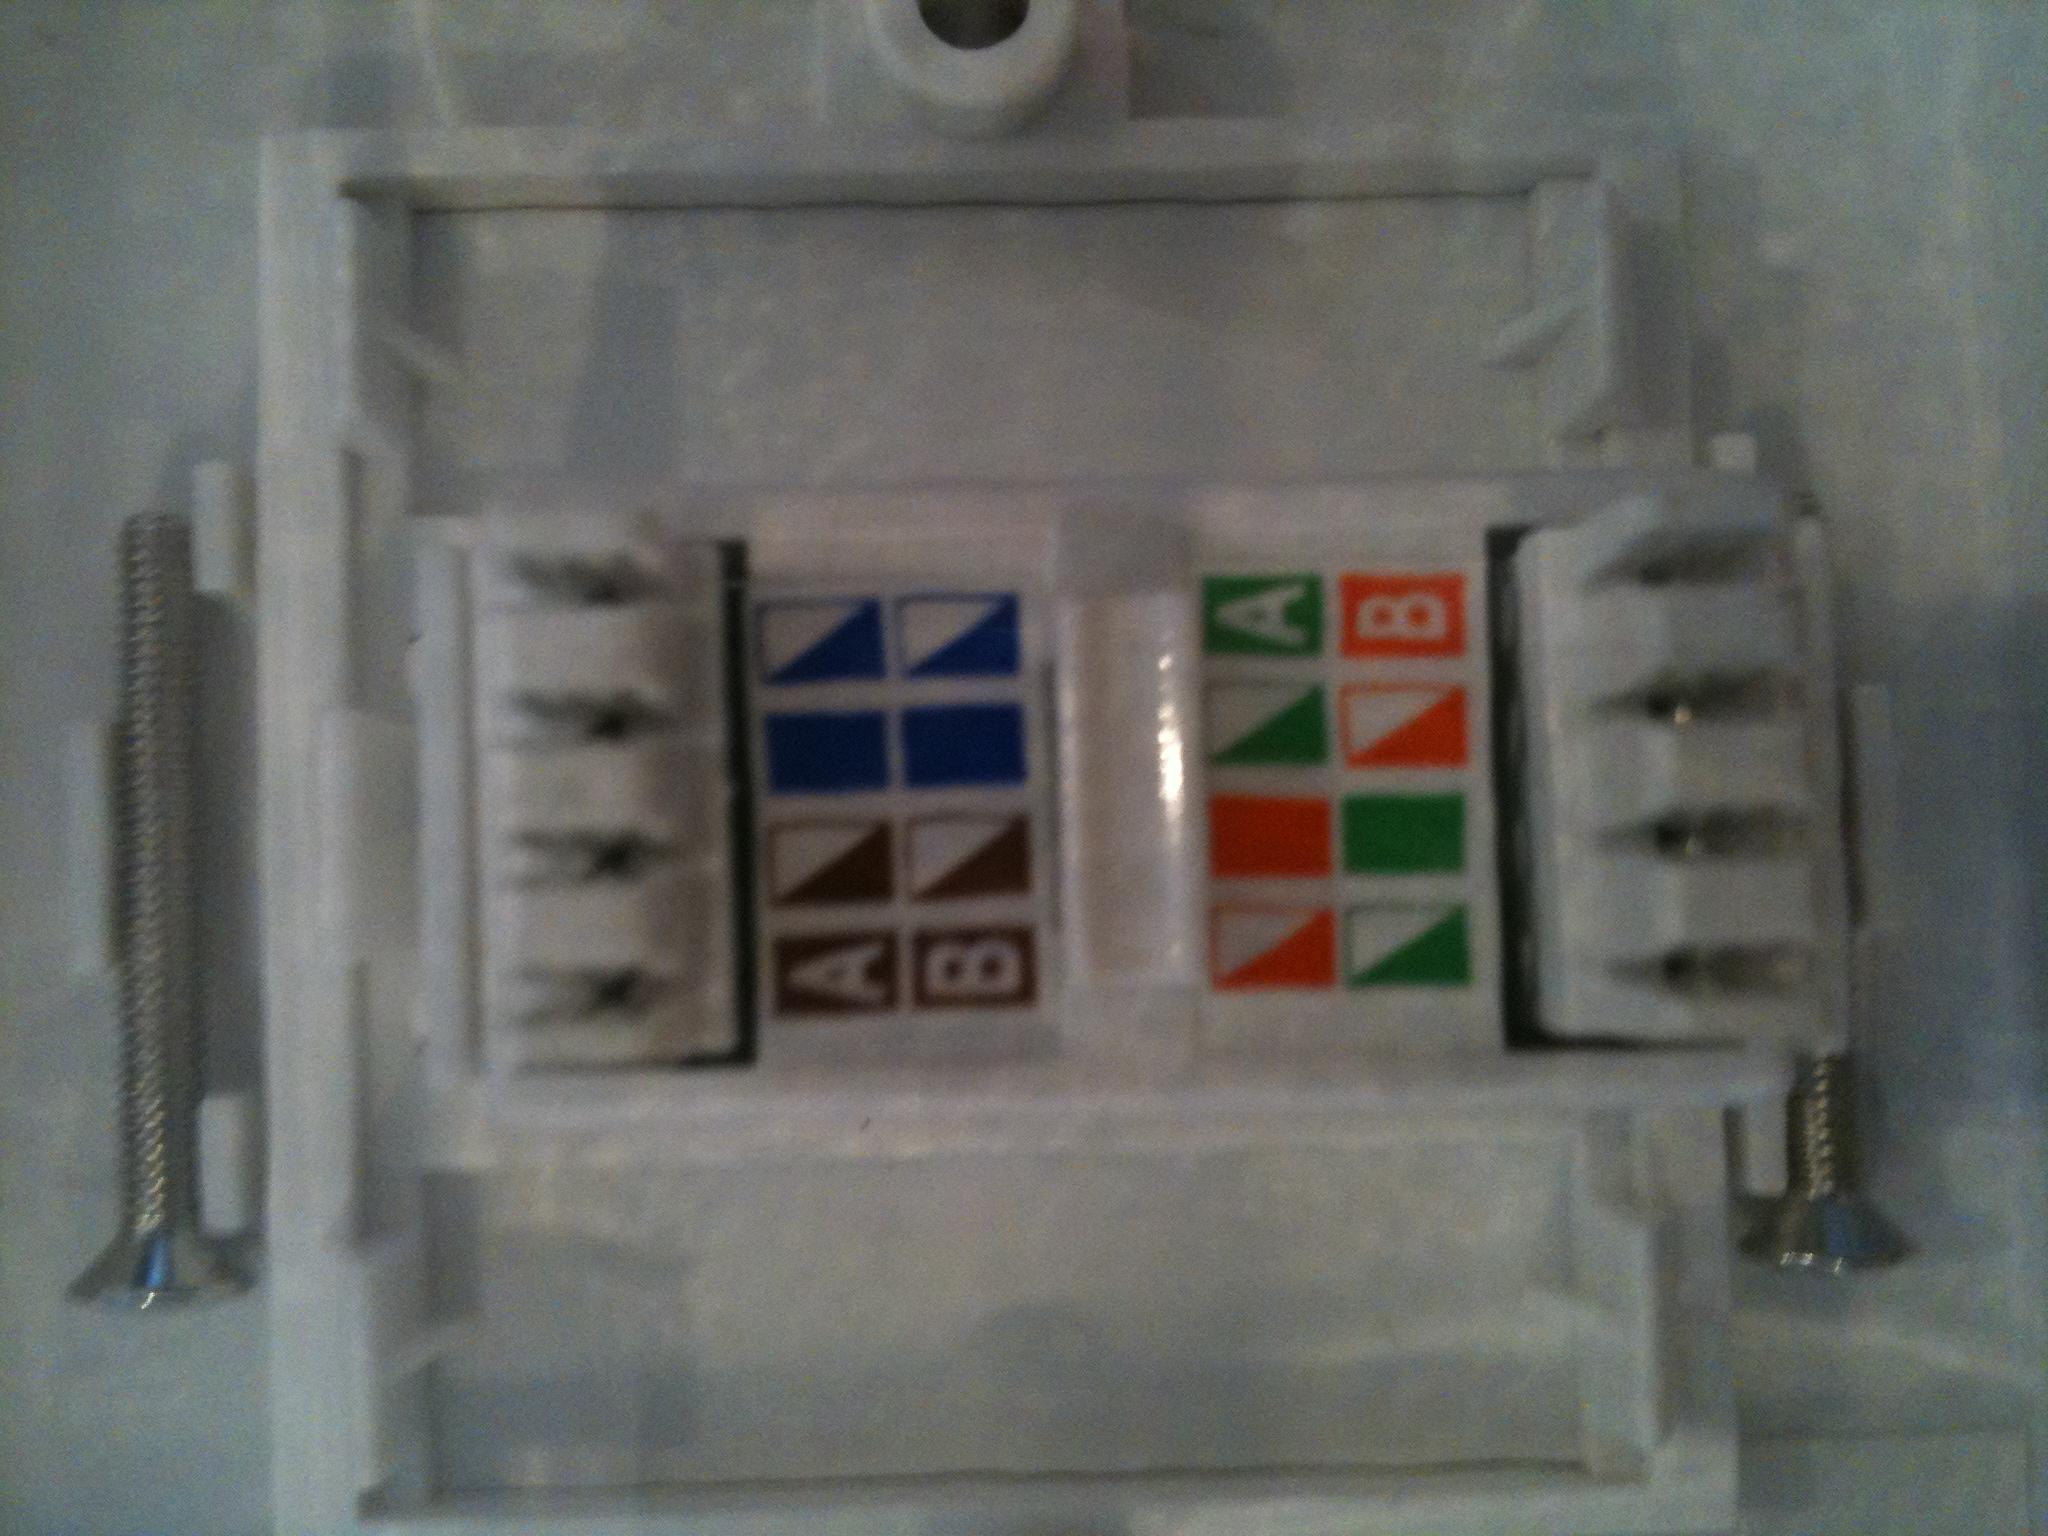 cat5 internet wiring diagram  cat5  get free image about rj45 socket wiring a or b rj45 socket wiring australia